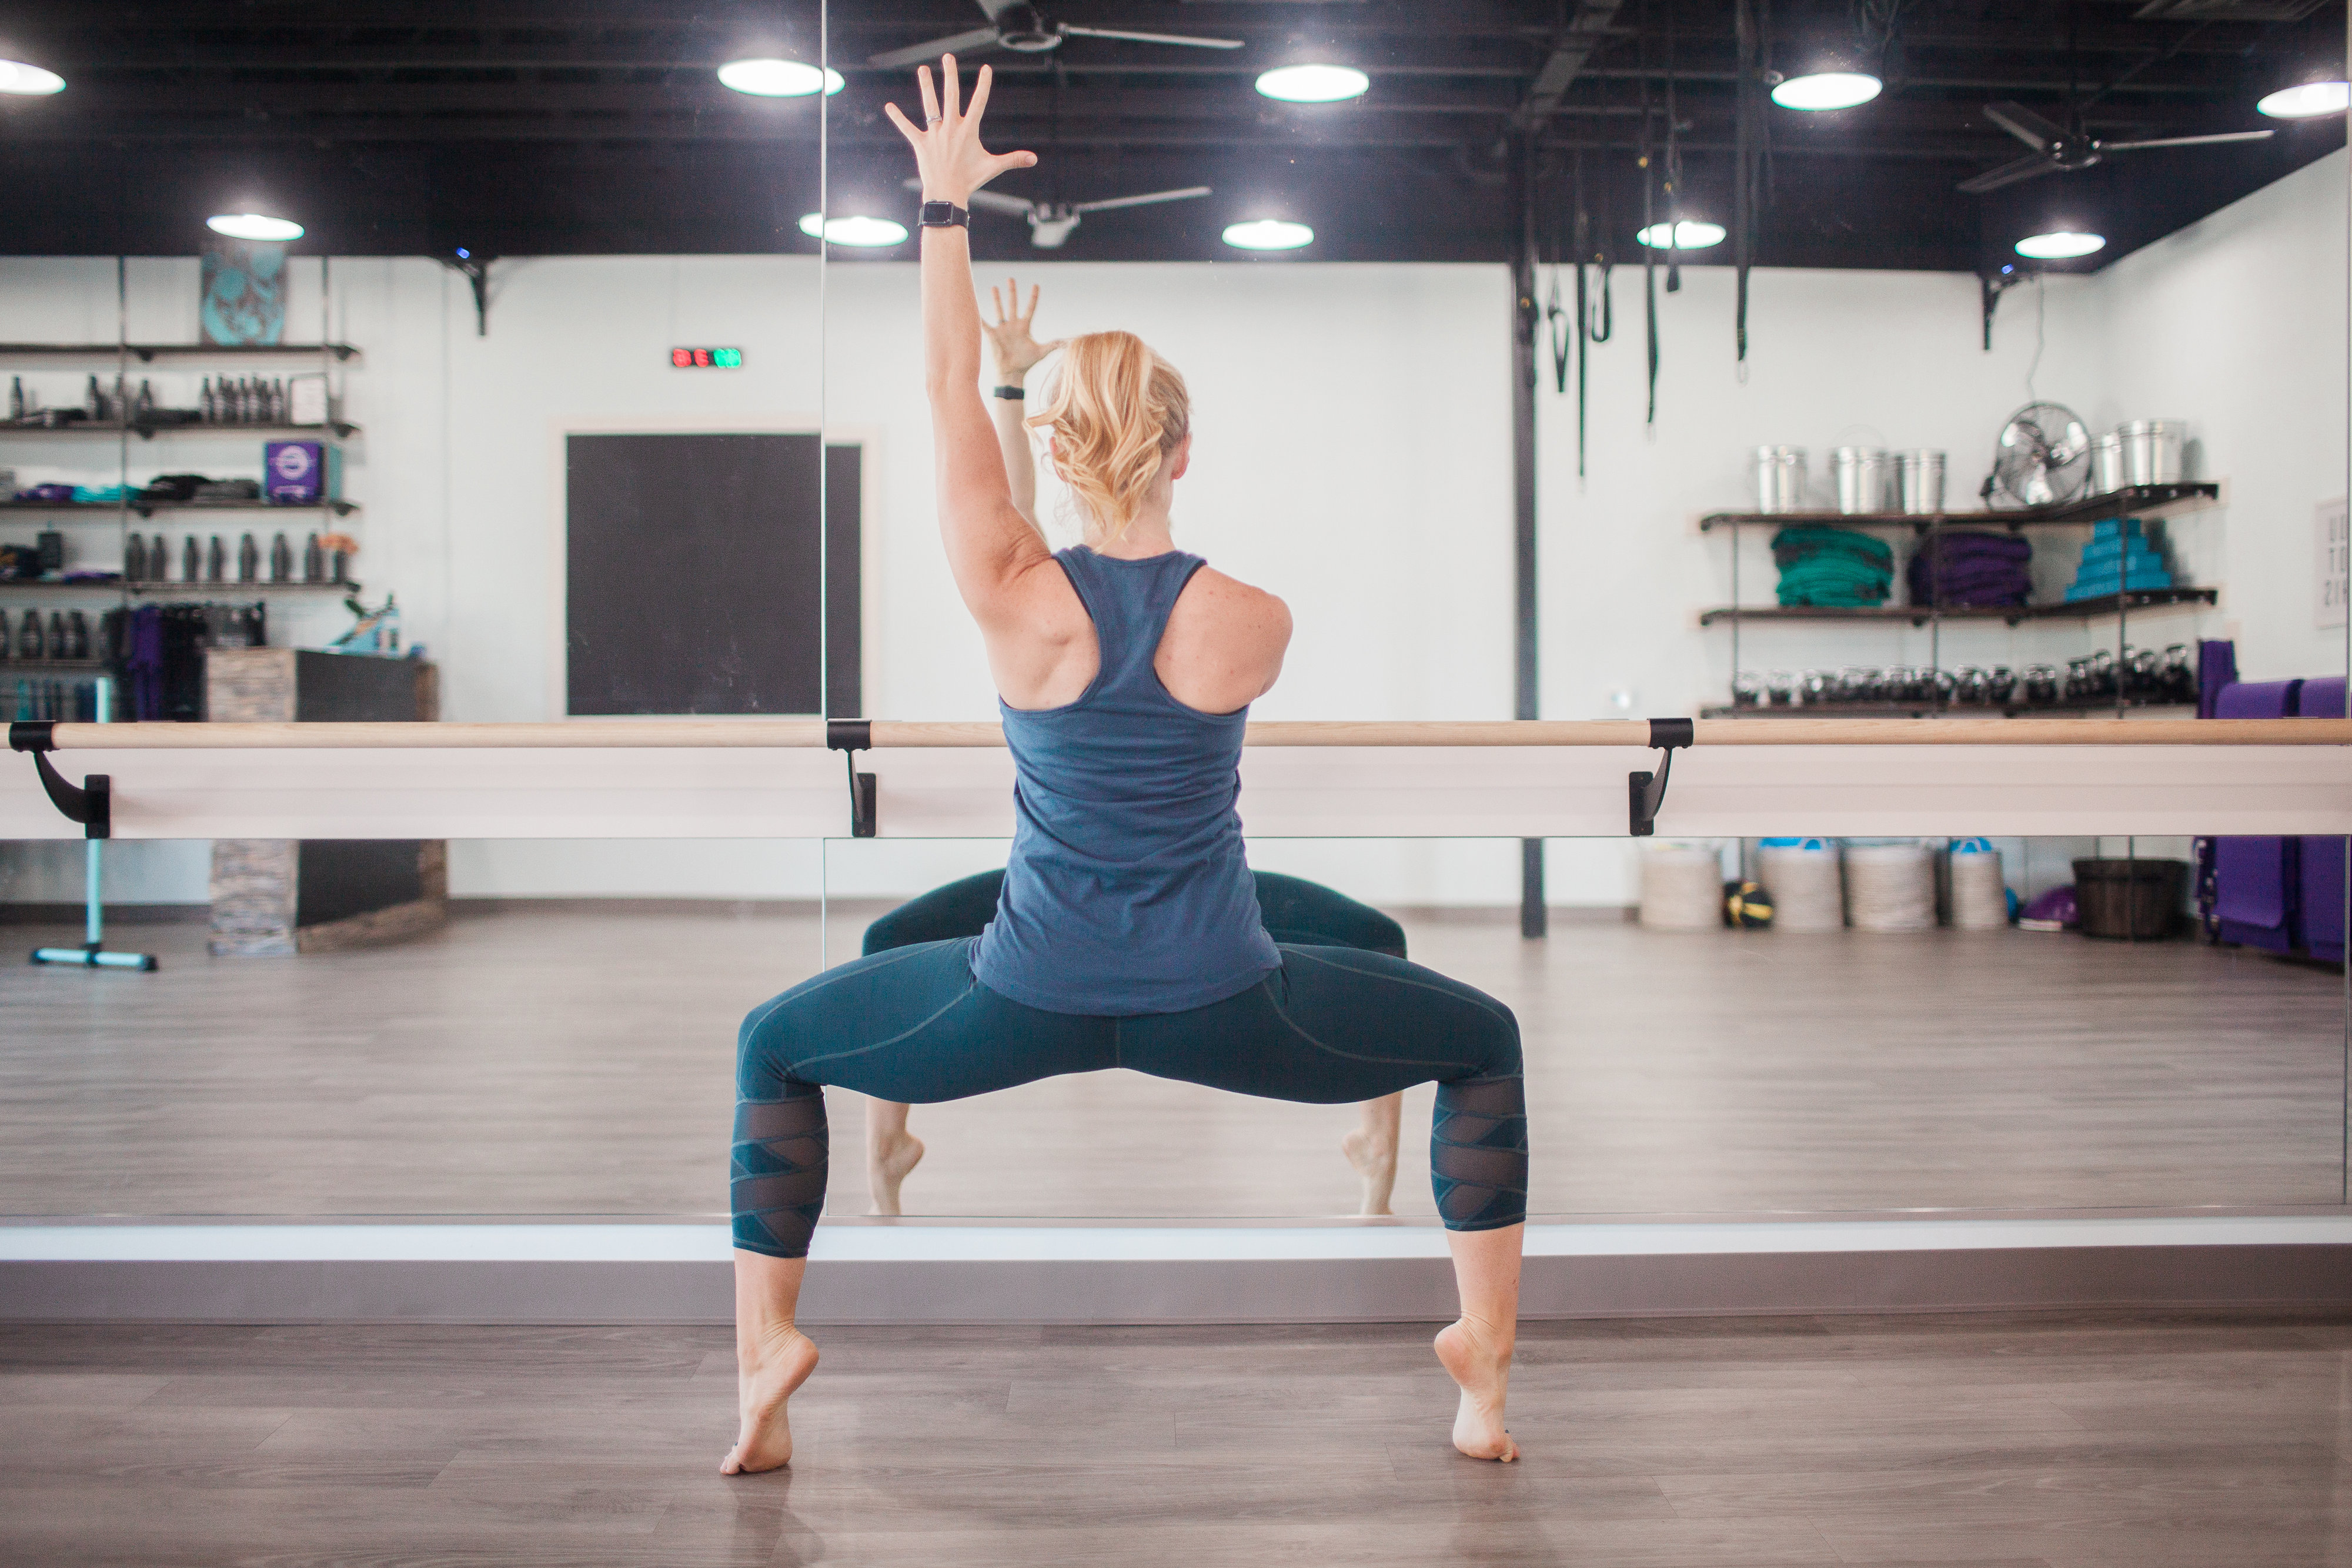 Balletone Master Trainer